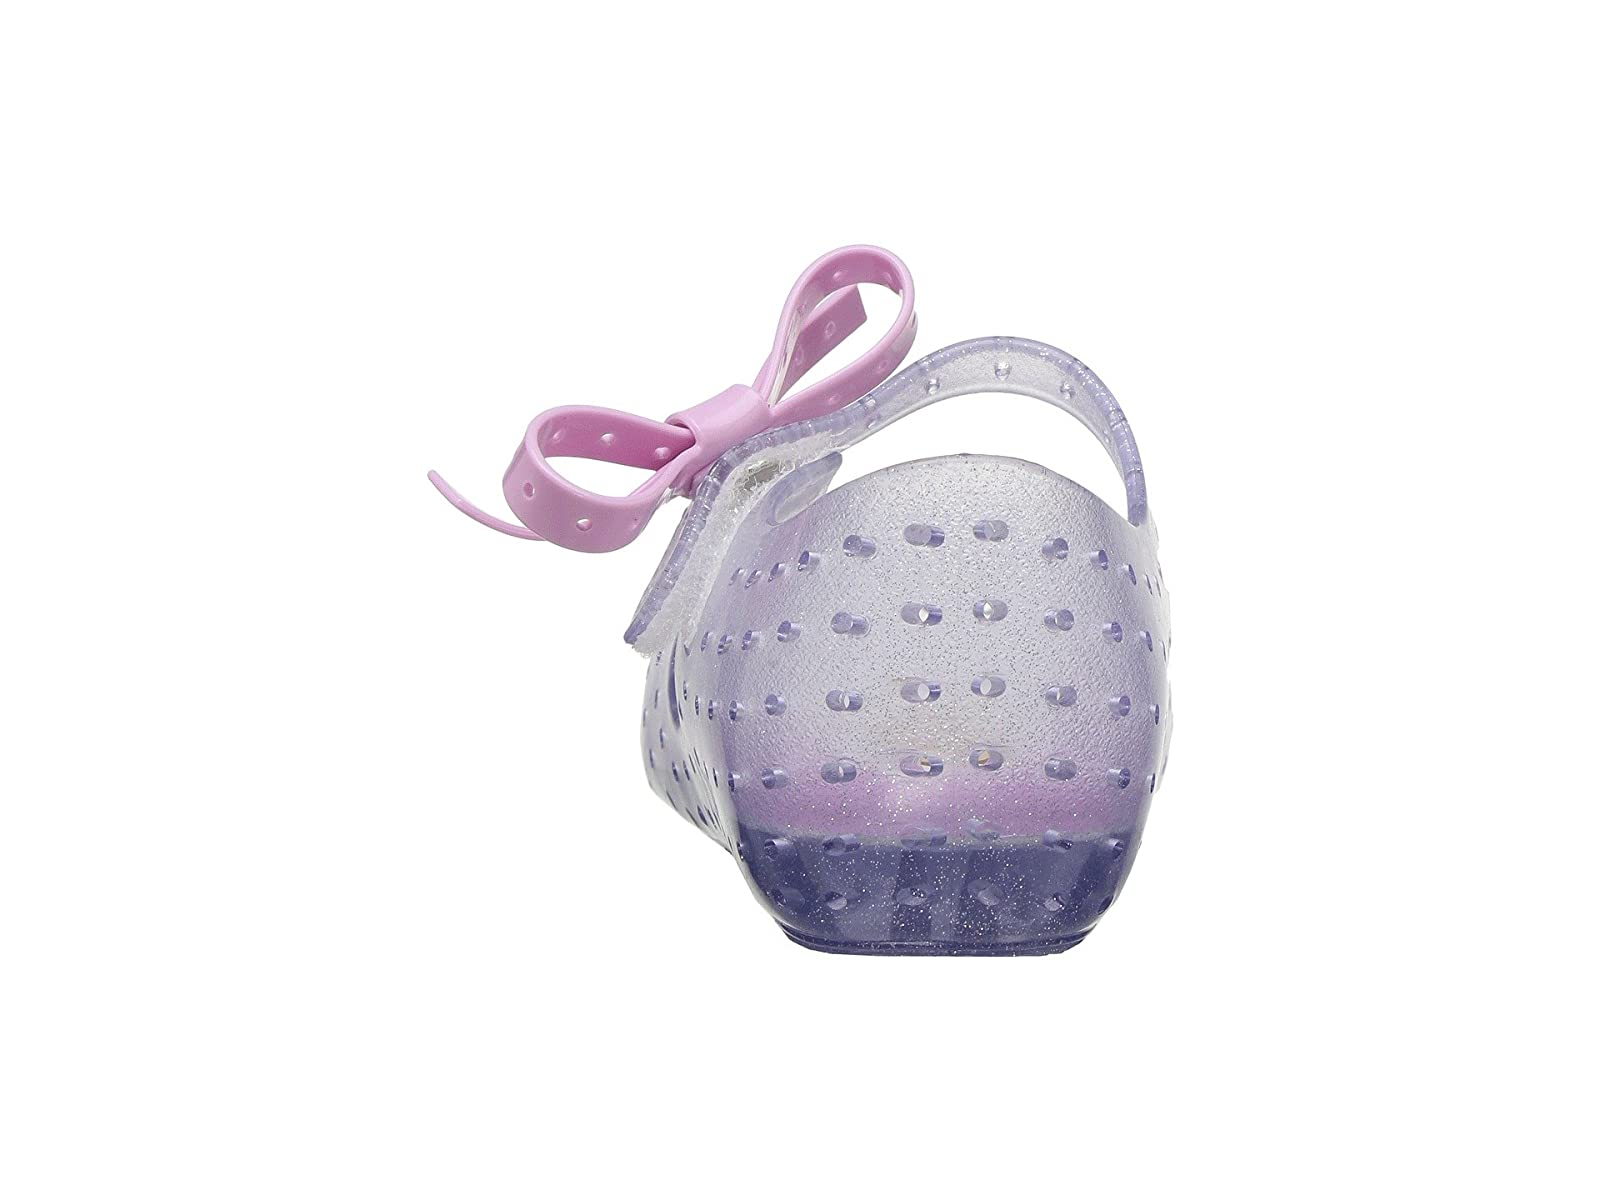 caractéristiques: homme / femme: mini - melissa melissa melissa mini furadinha x (bébé / enfant) b0659e